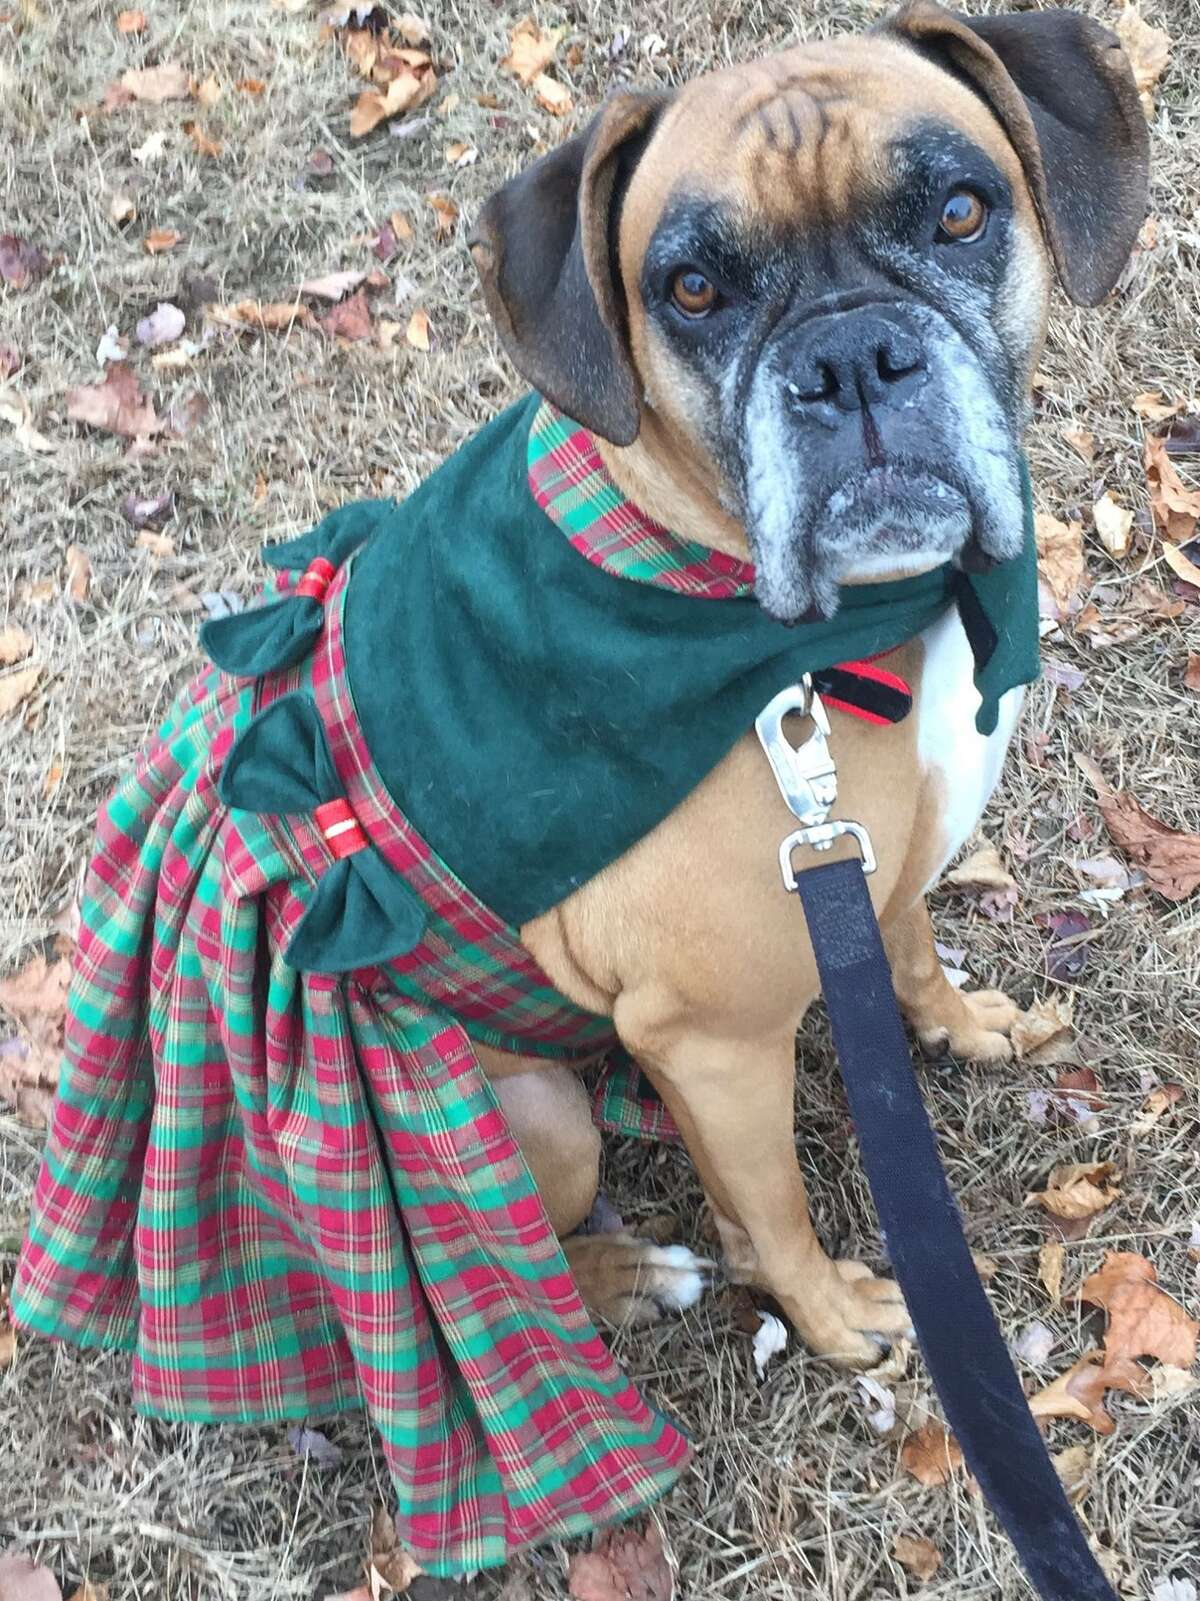 Beth M. Pellegrino. It's her custom made, Scottish plaid Christmas dress. ORG XMIT: FDqgoUqCD5A9wv22NXzA